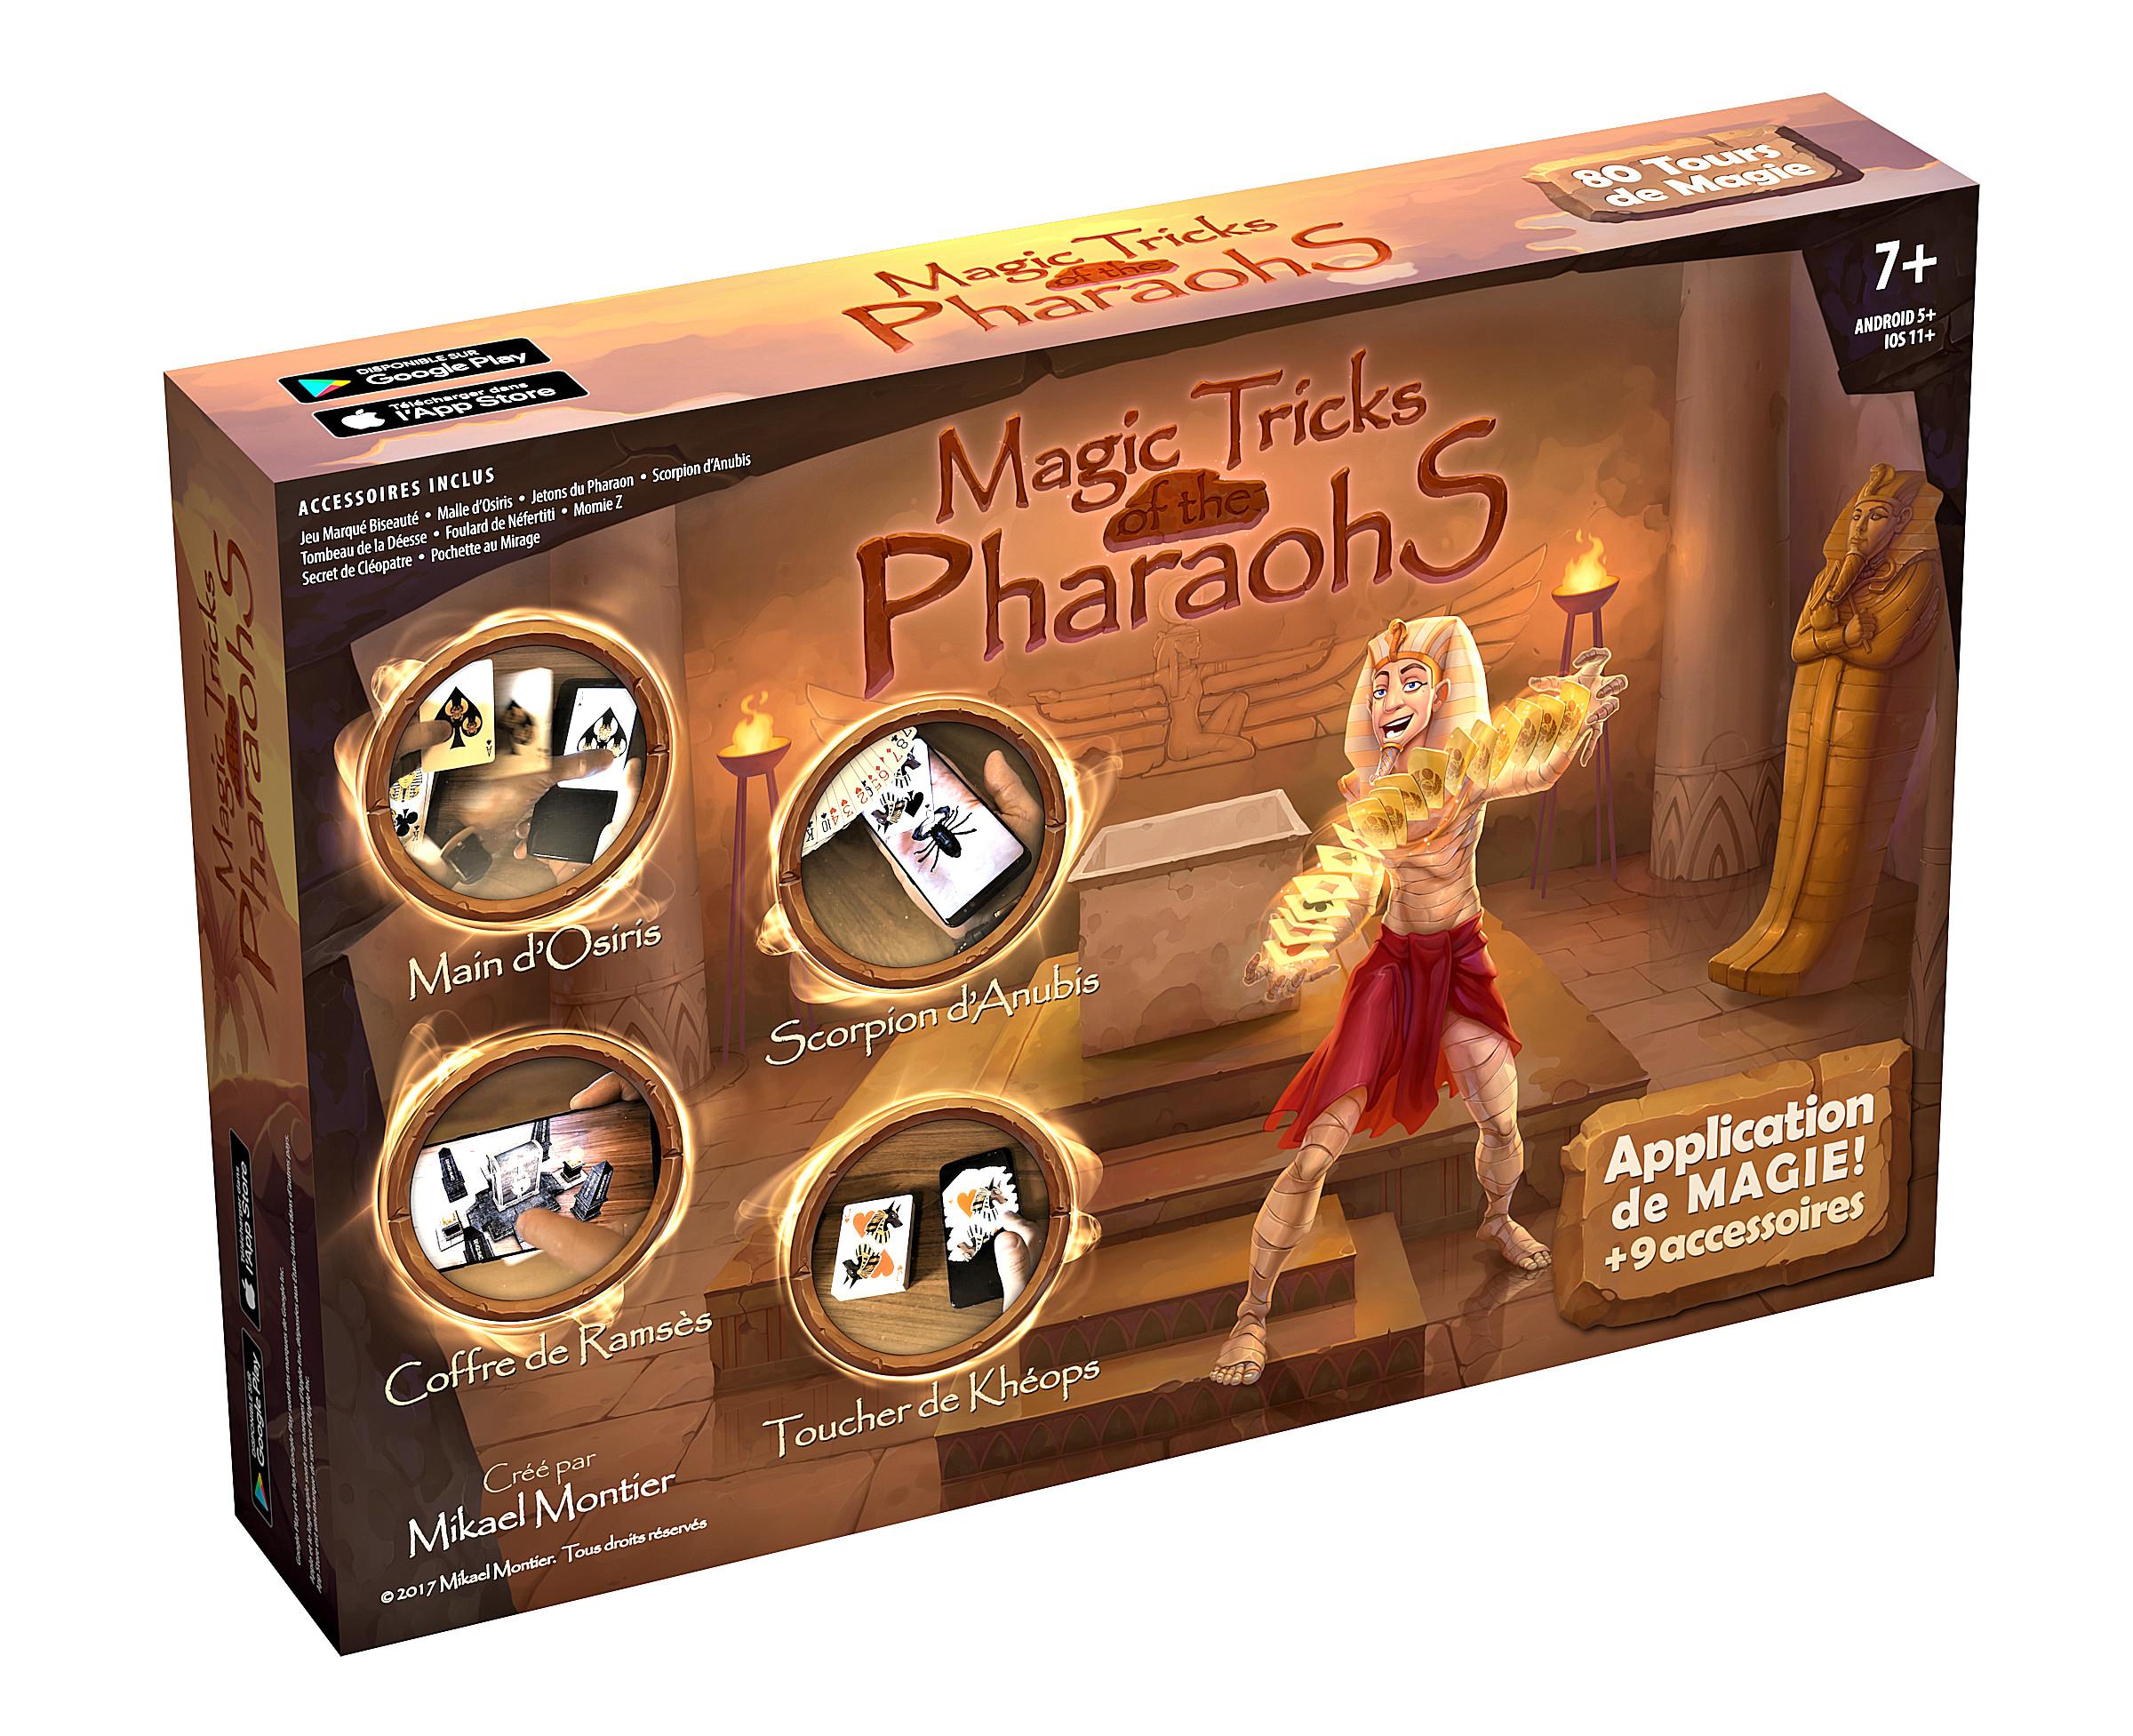 Magic Tricks of the Pharaohs (80 Magic Tricks)